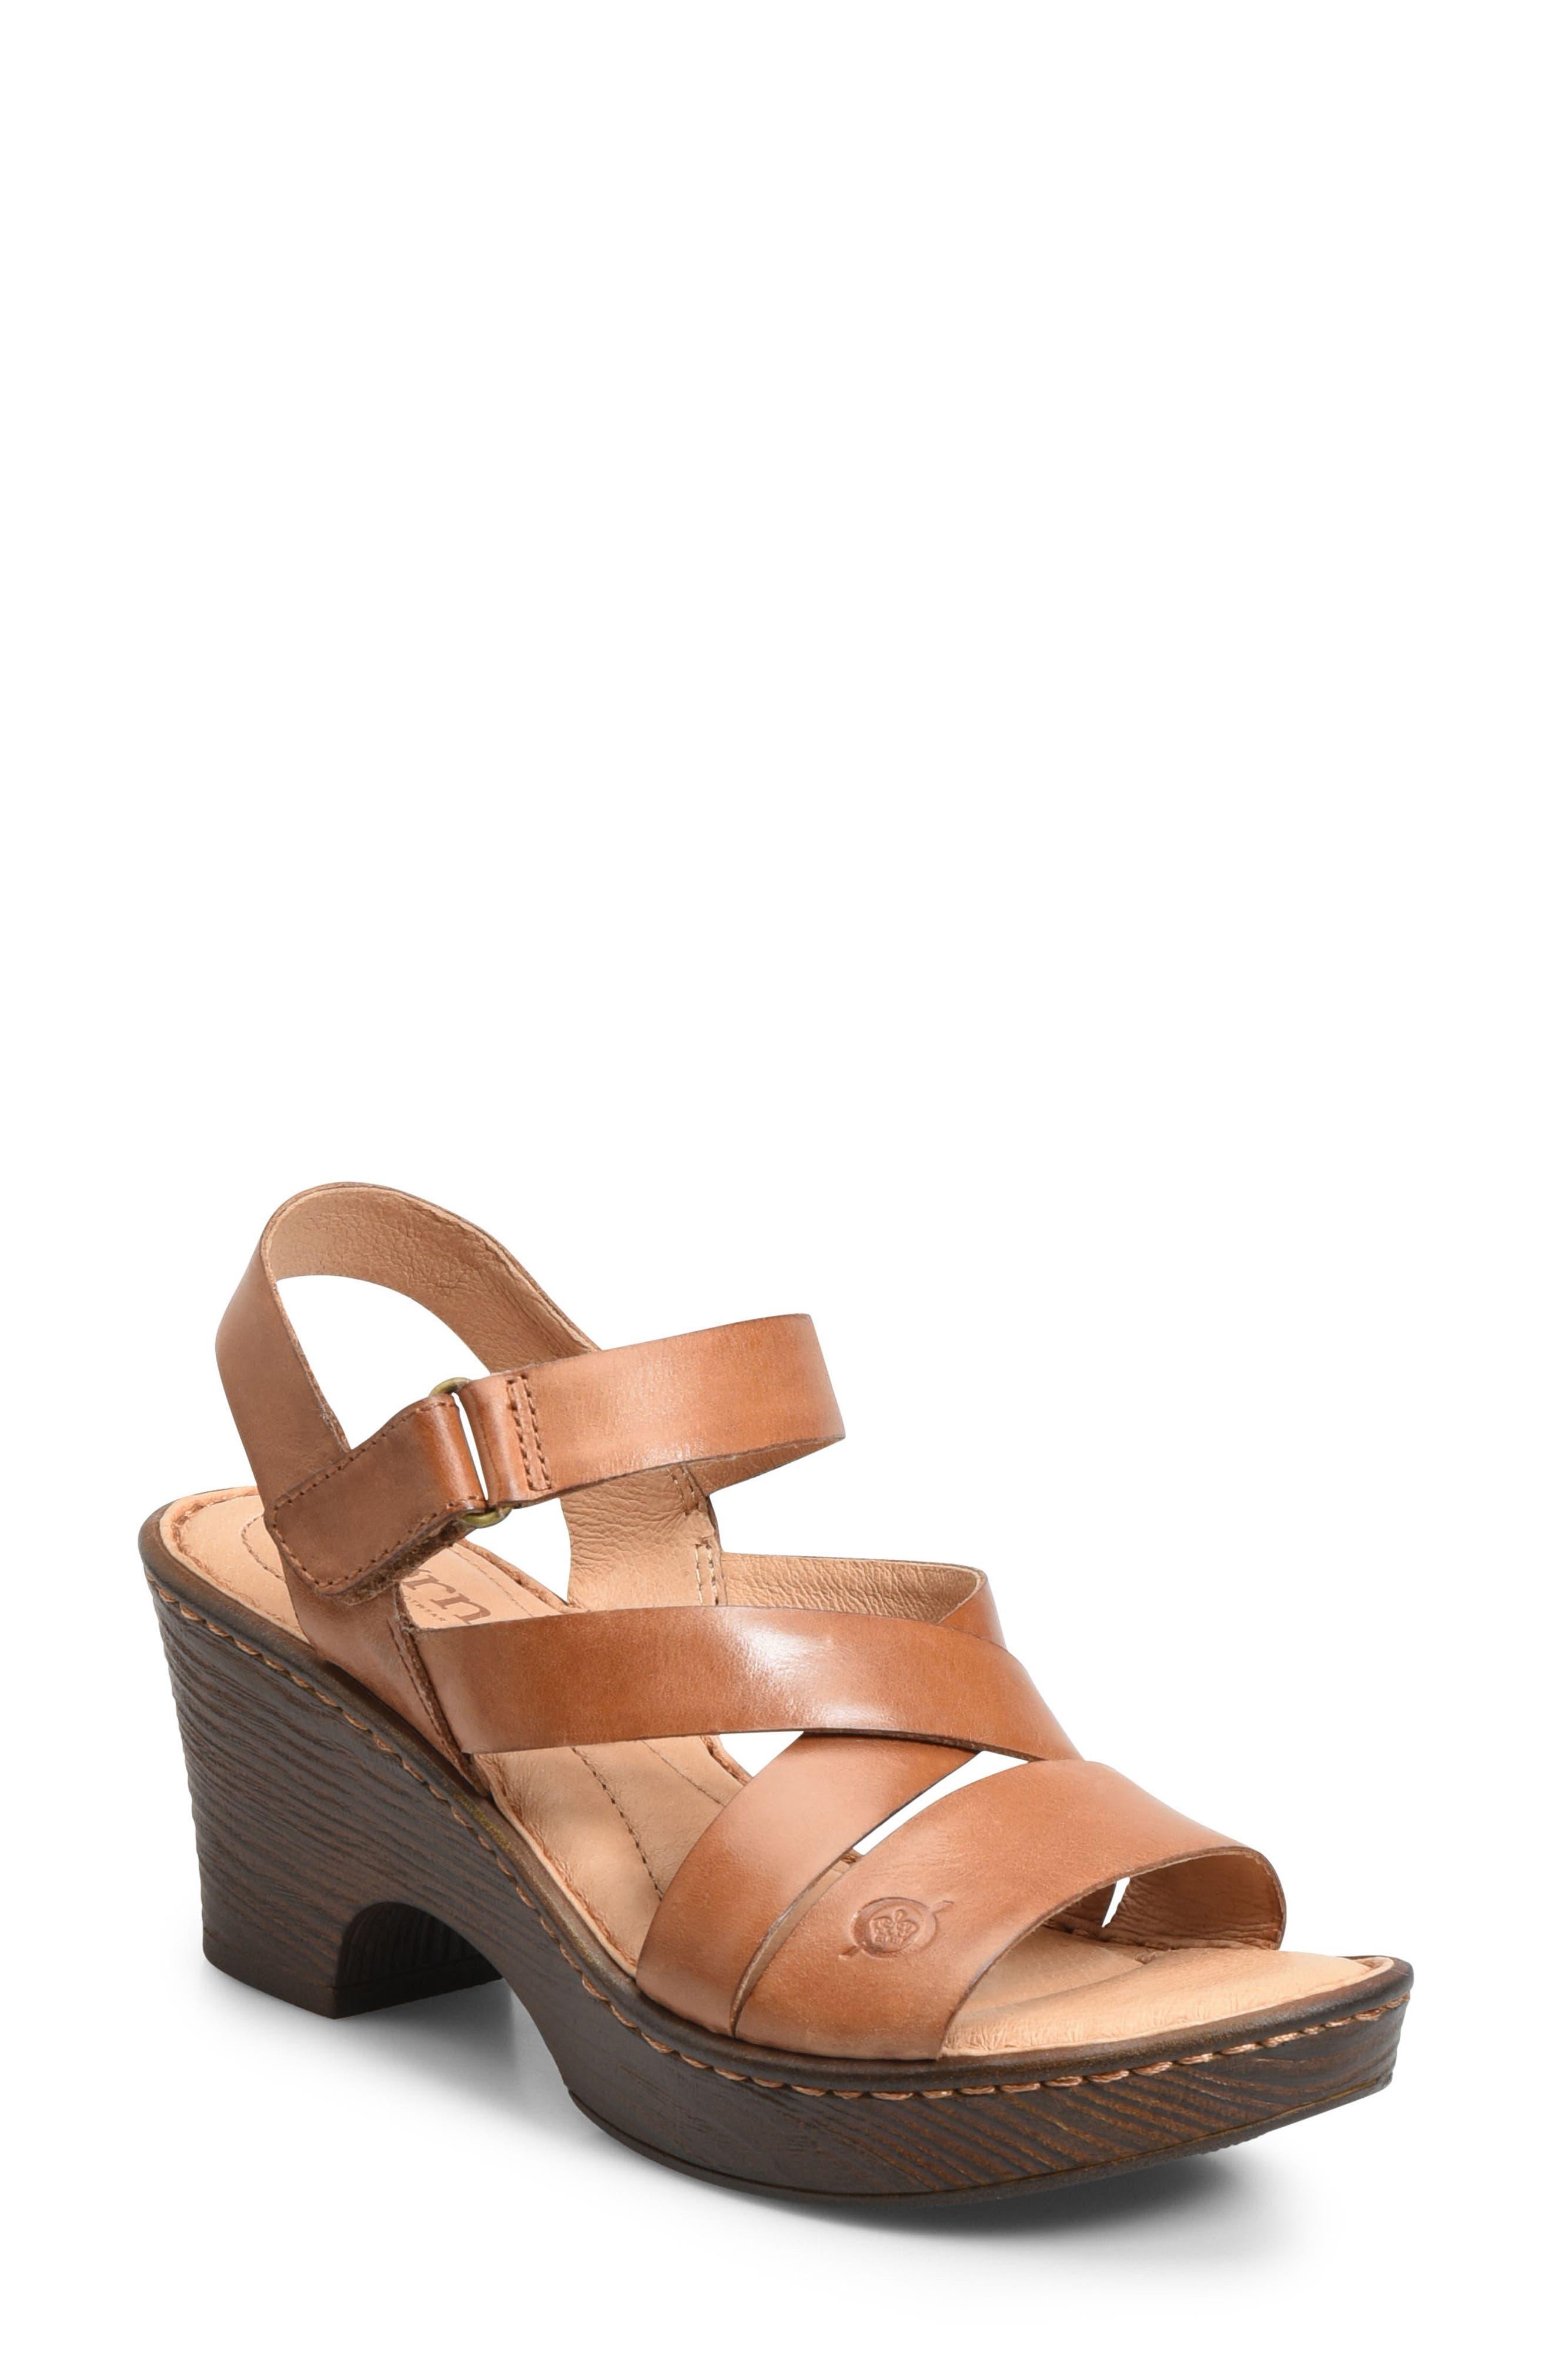 Cubera Platform Sandal,                             Main thumbnail 1, color,                             Brown Leather